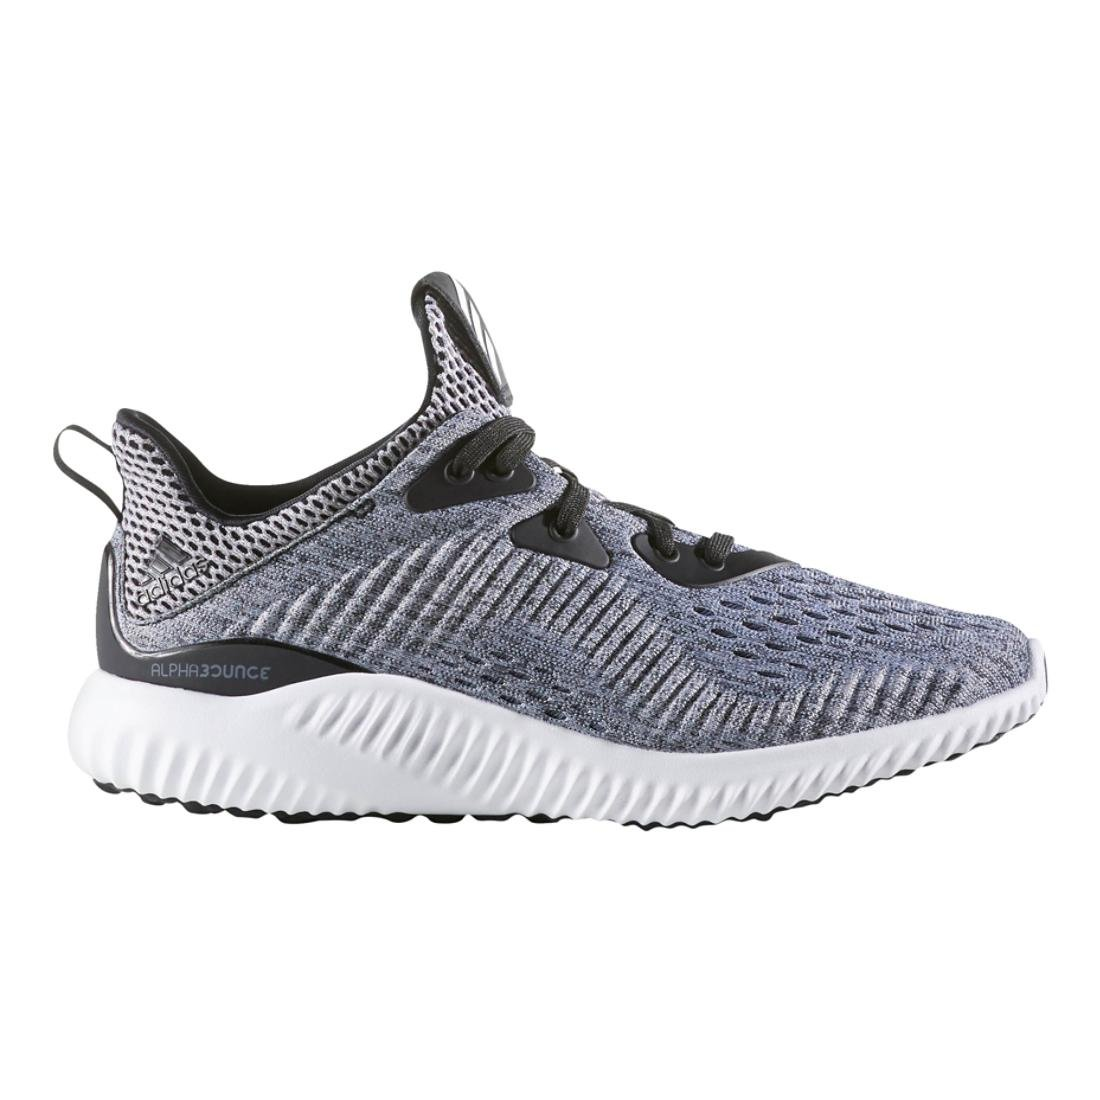 adidas Performance Boys' Alphabounce Em j Running Shoe, Black/White/Black, 4 M US Big Kid